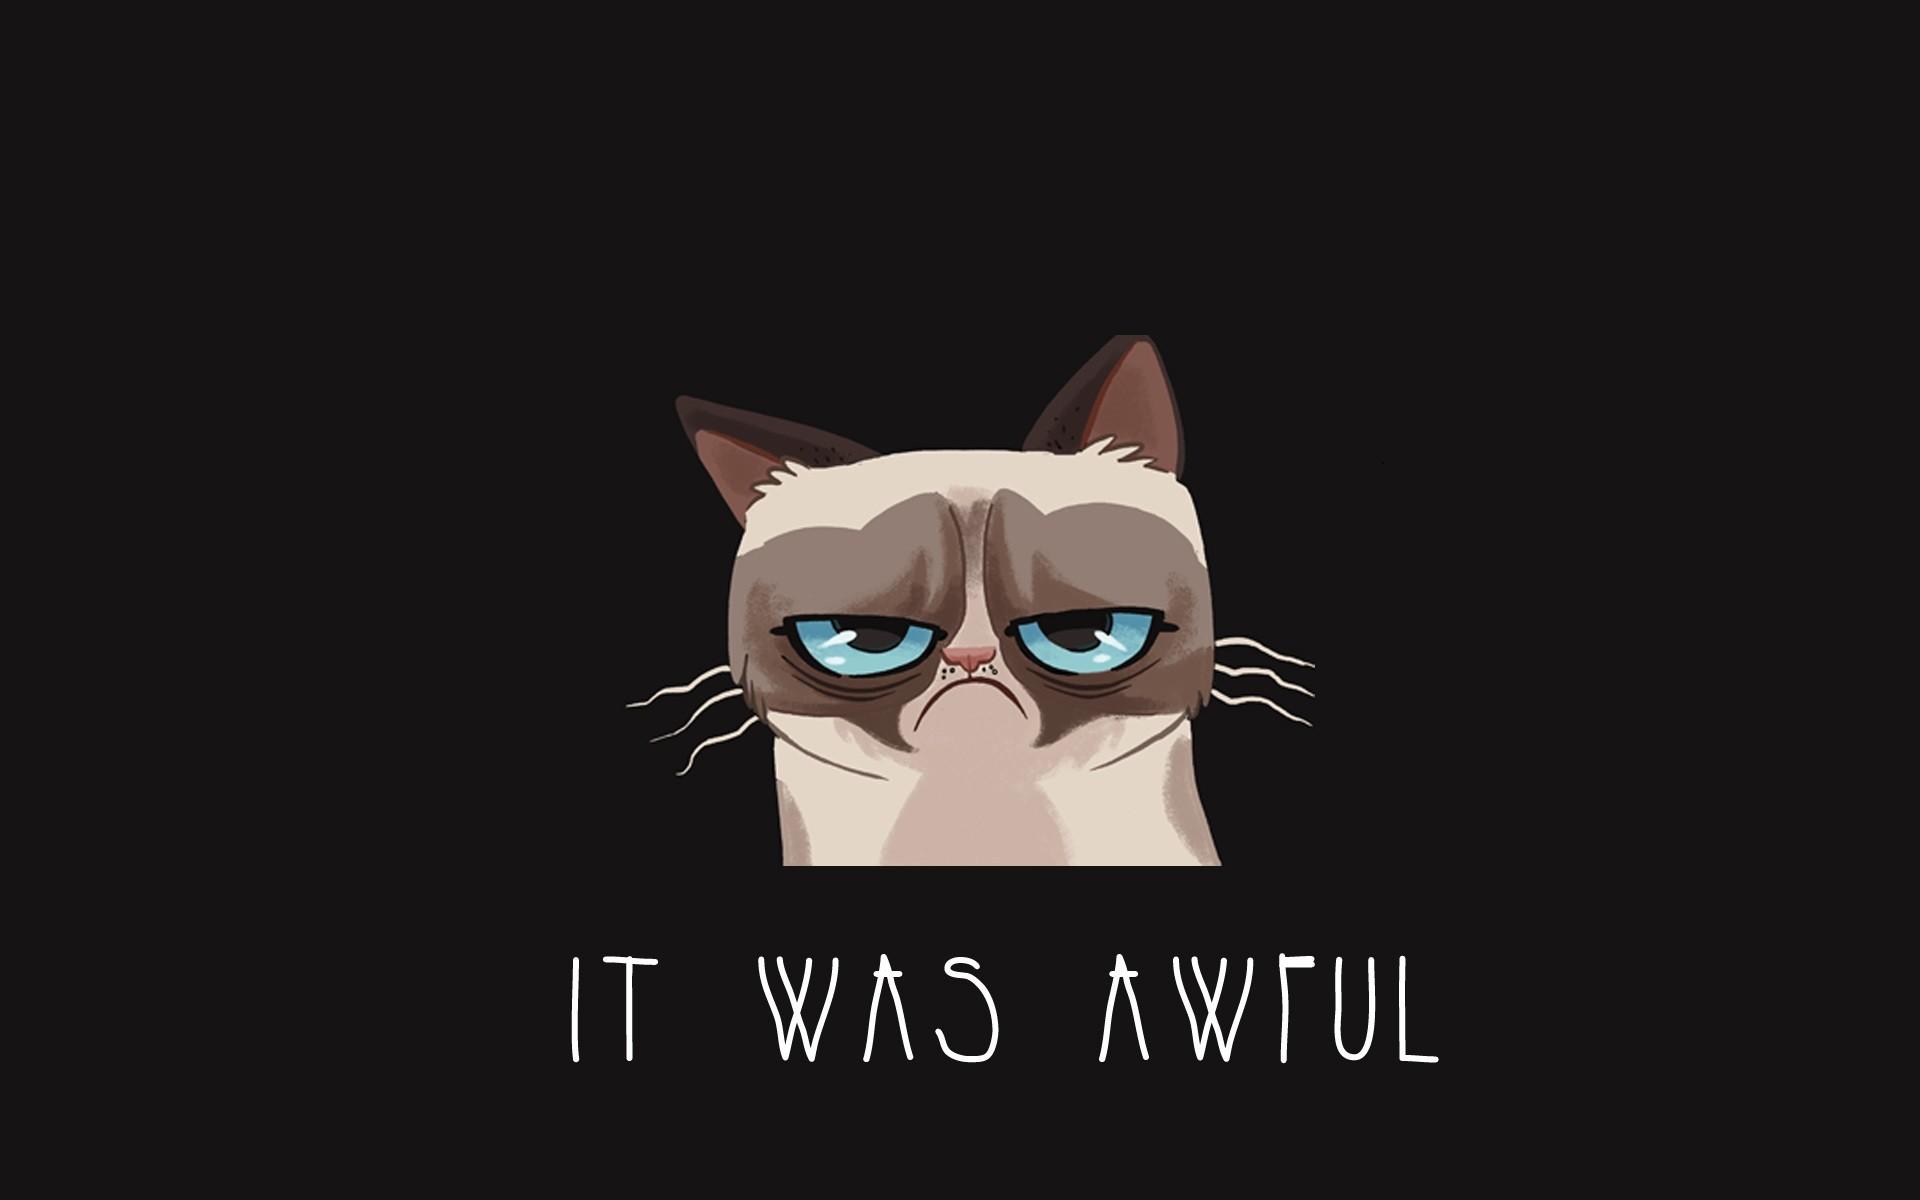 Free Funny Screensavers 2: Fondos De Pantalla : Ilustración, Gato, Dibujos Animados